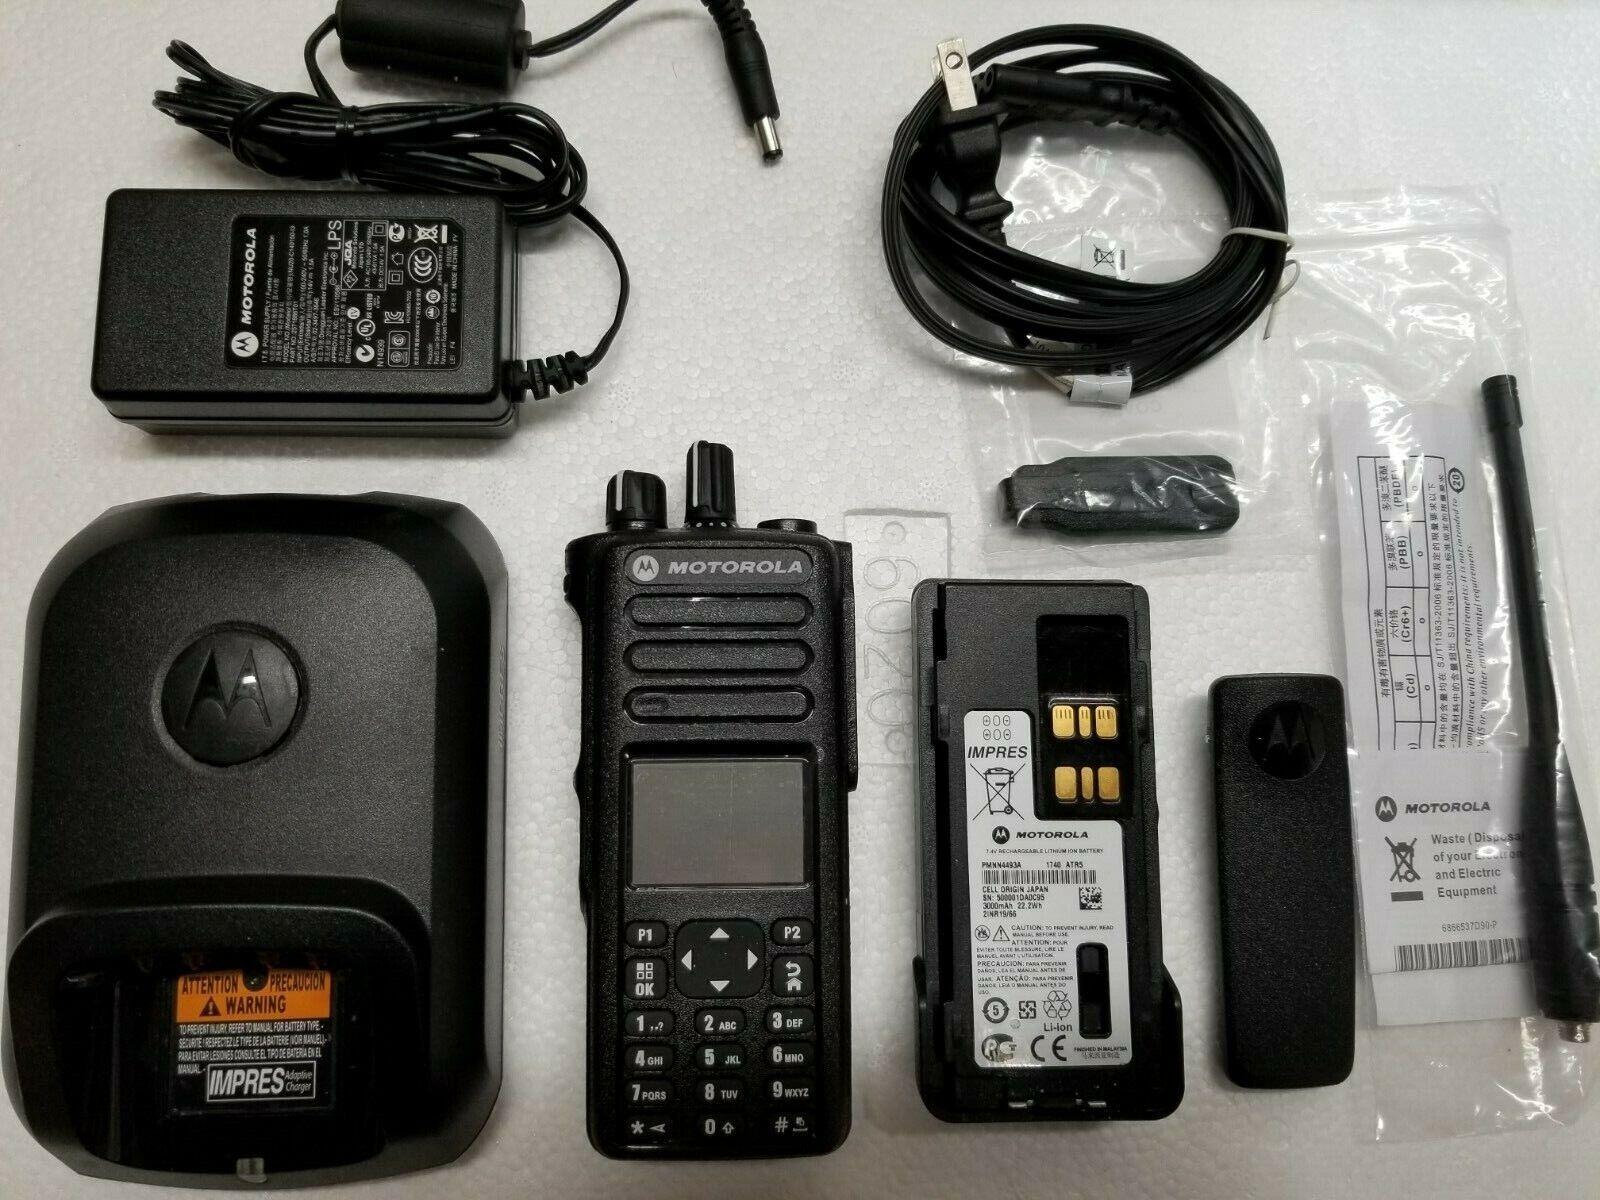 Motorola MotoTRBO XPR7550 UHF 403-512mhz Digital Radio AAH56RDN9KA1AN XPR. Buy it now for 450.00